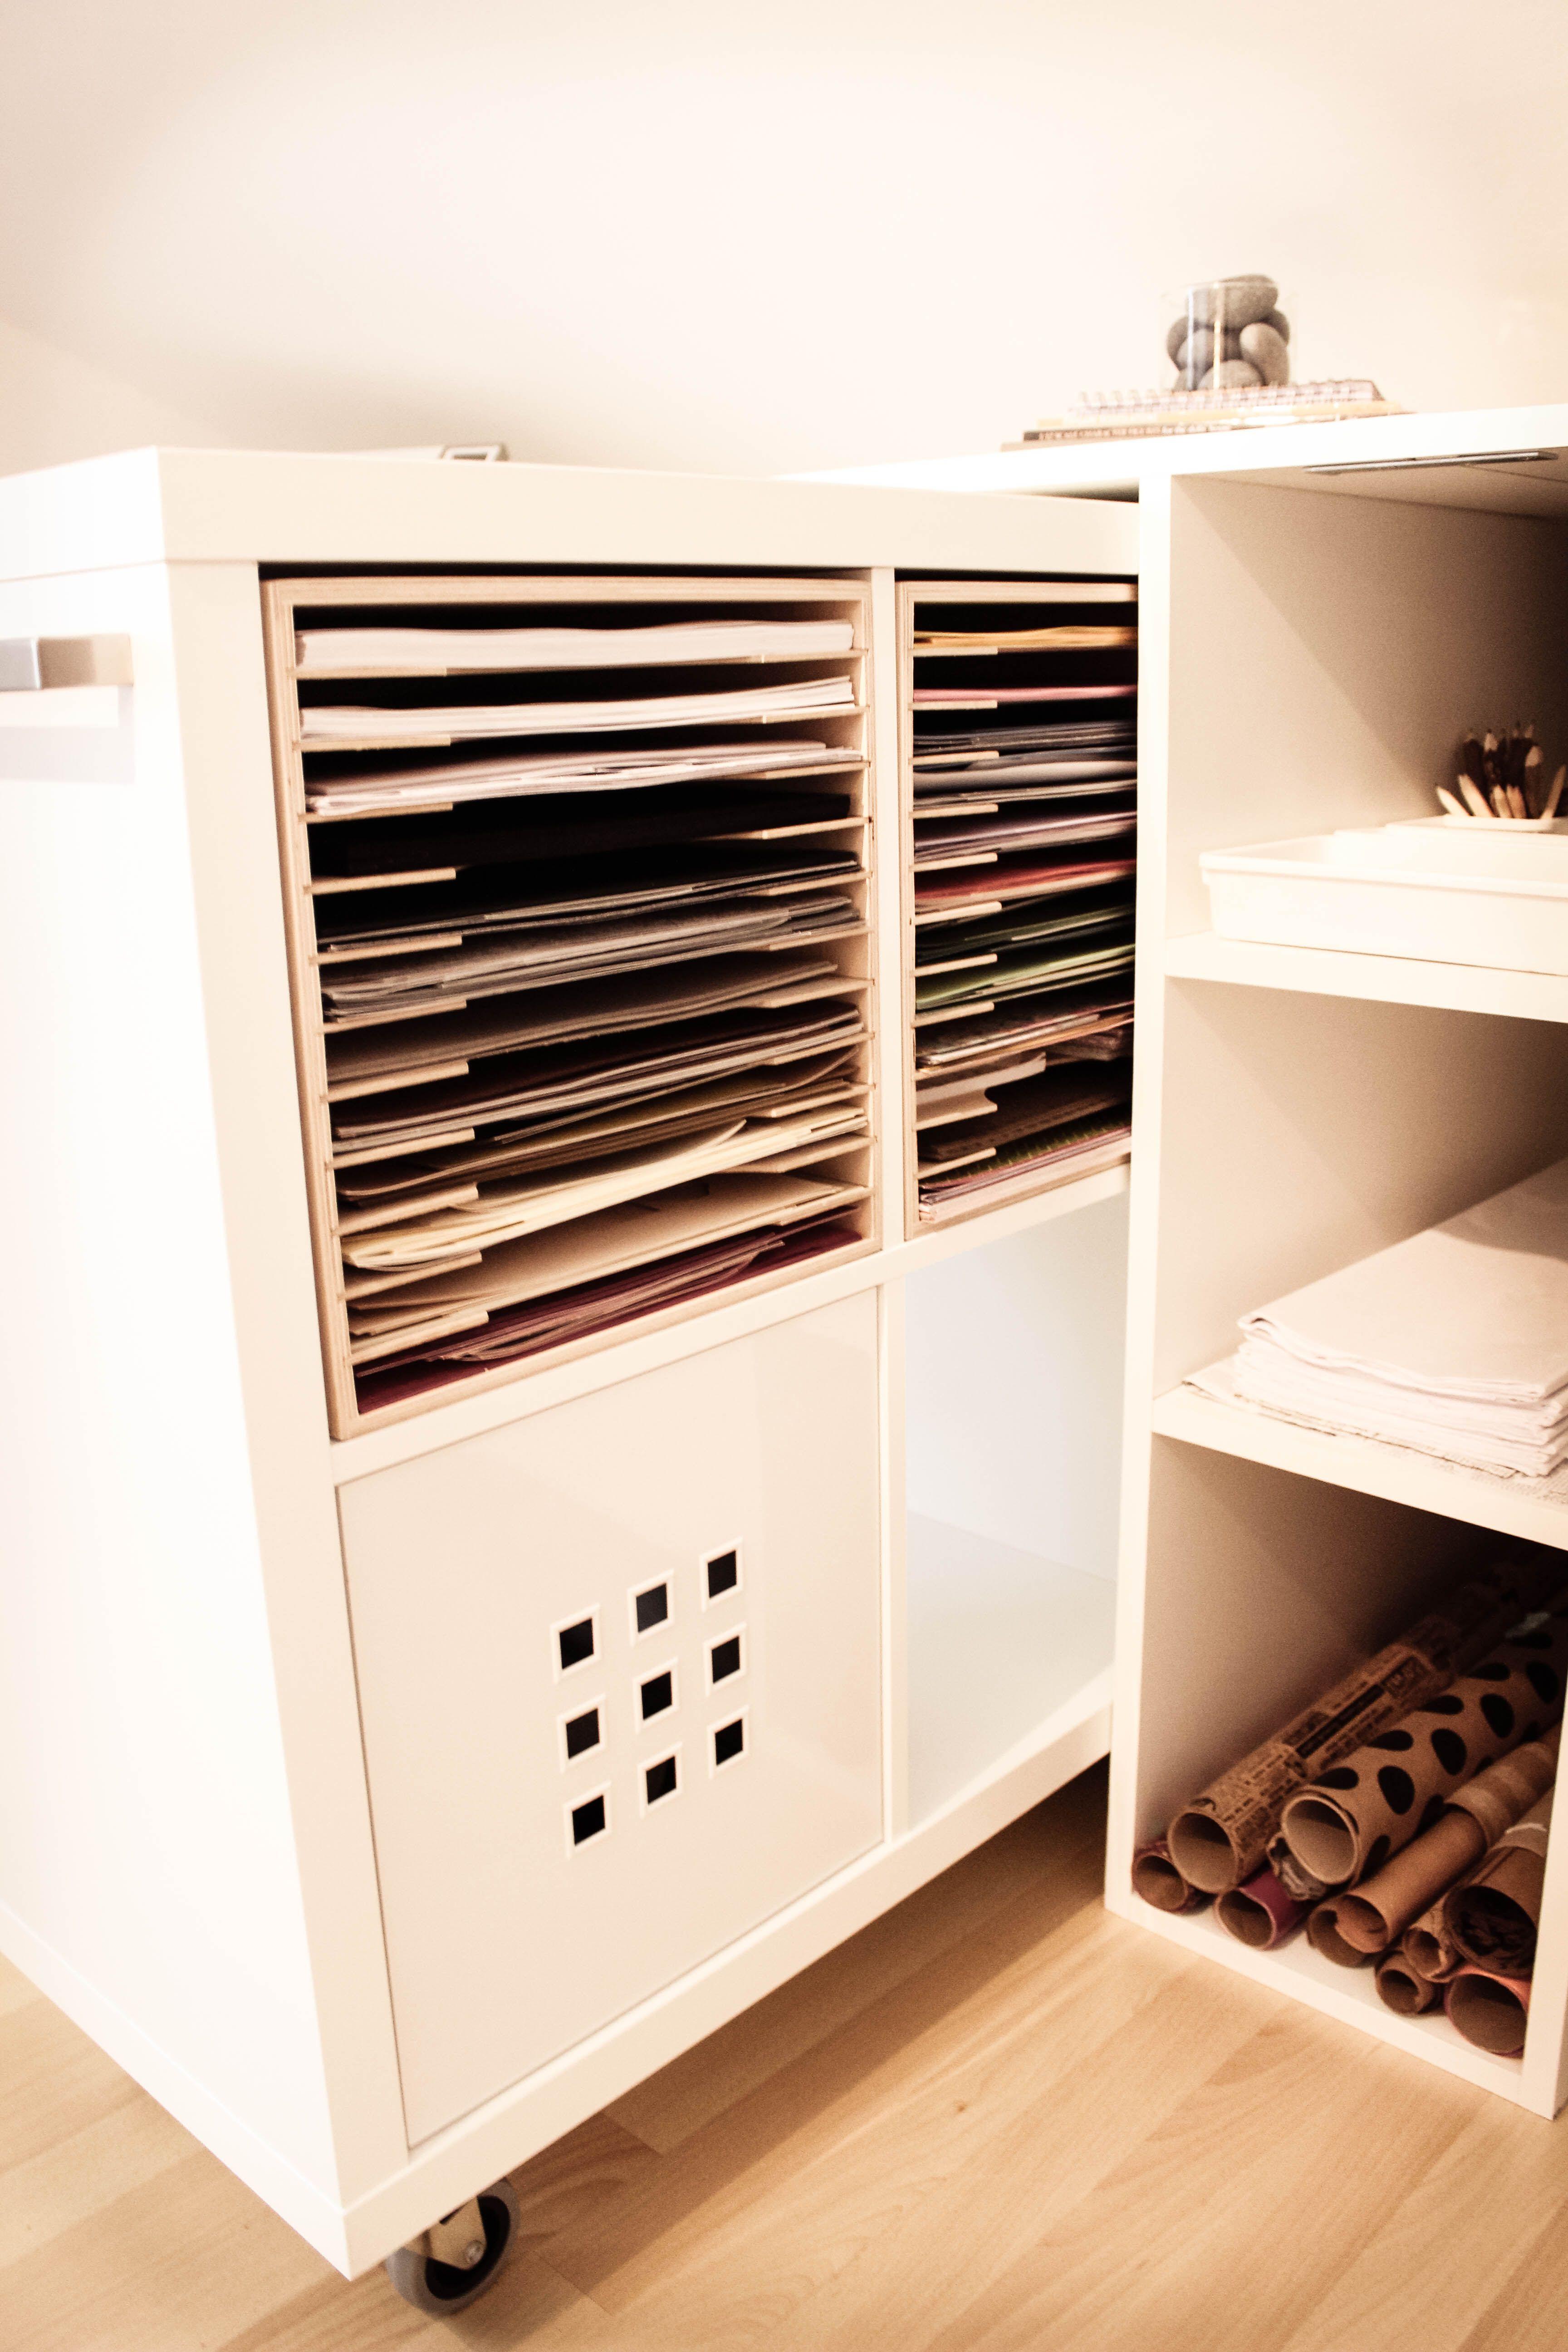 Ikea Hack Kallax Shelf Unit Mounted On Castors With Handle And